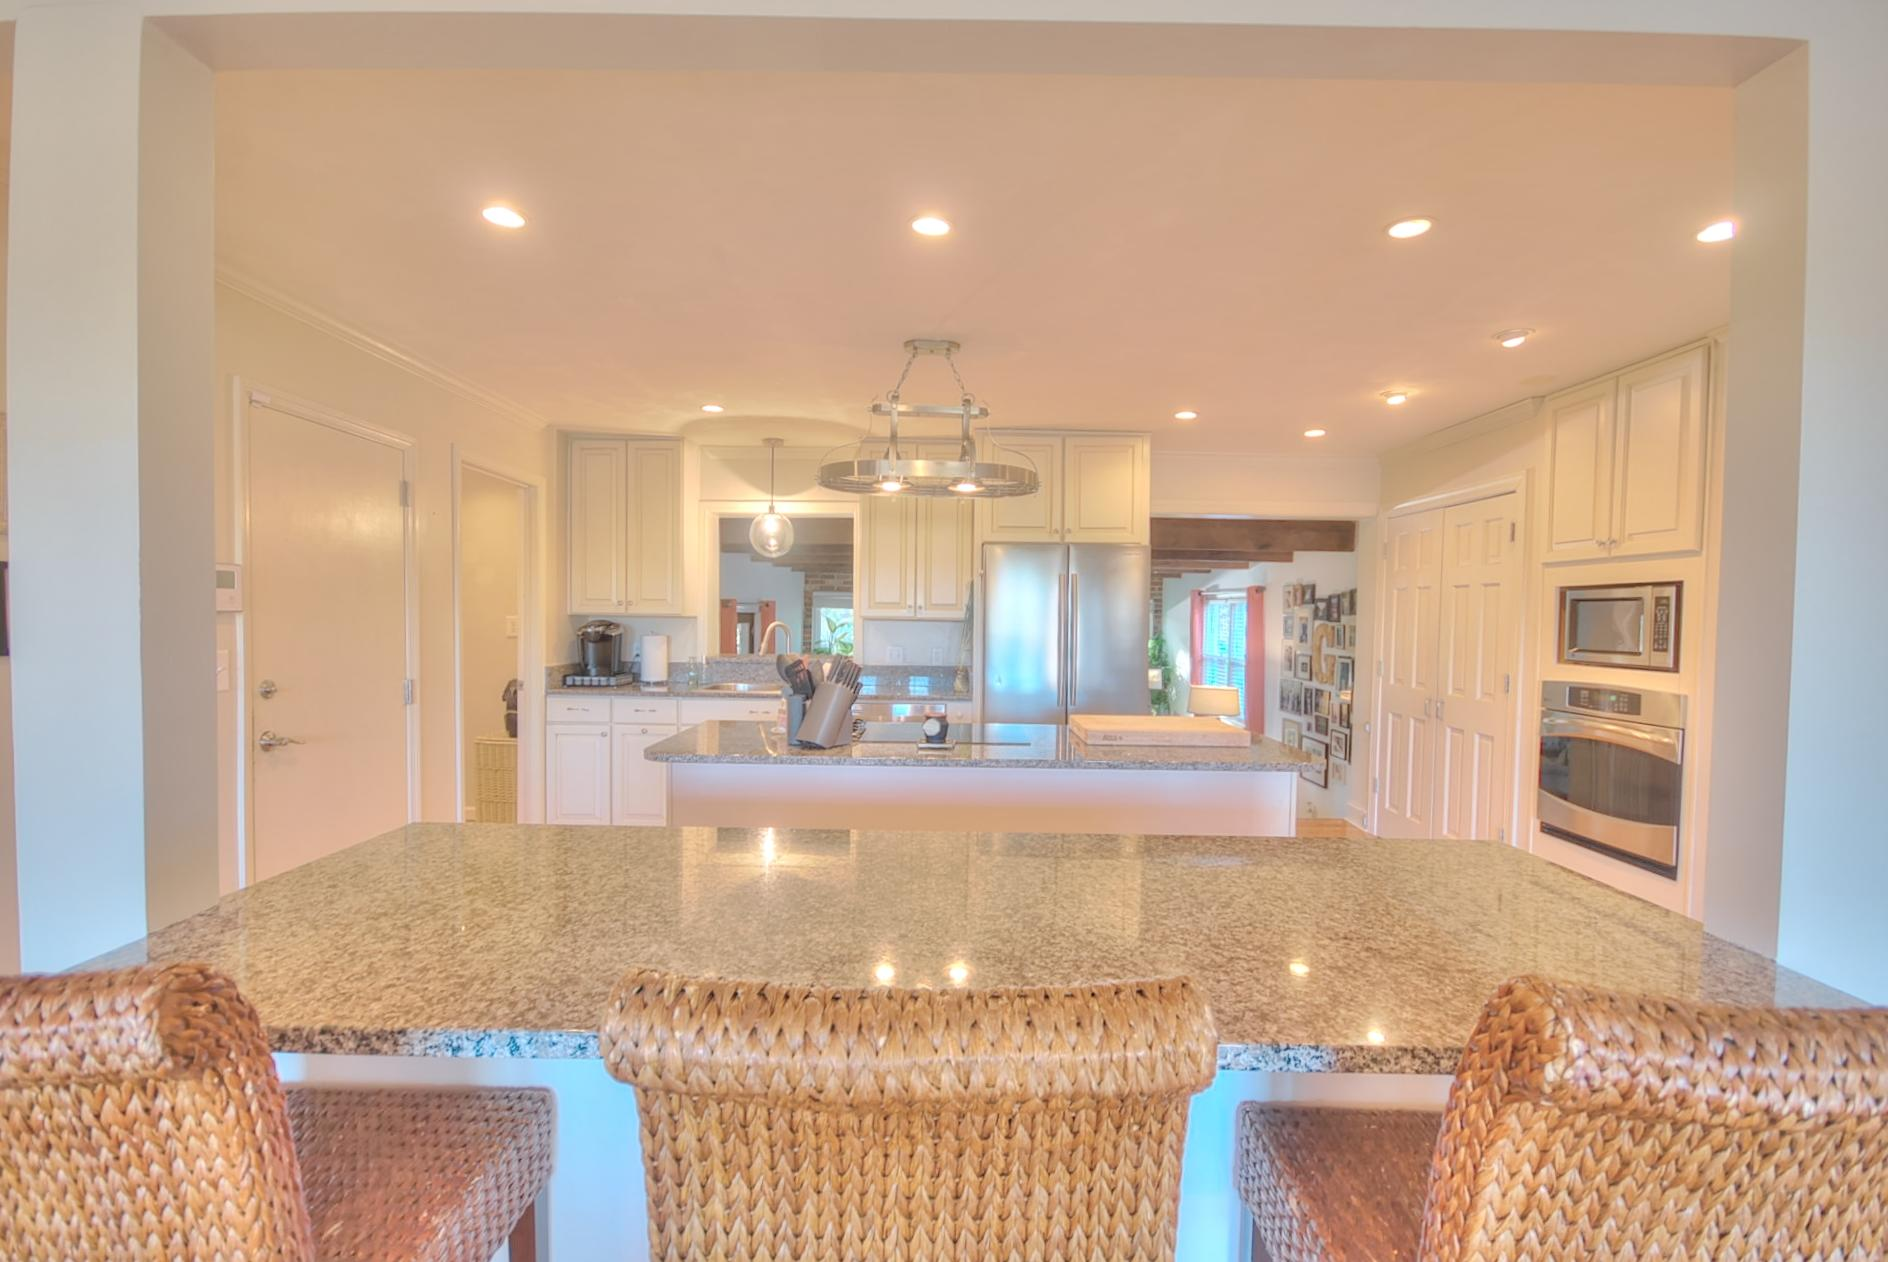 Capri Isles Homes For Sale - 213 Wappoo, Charleston, SC - 2